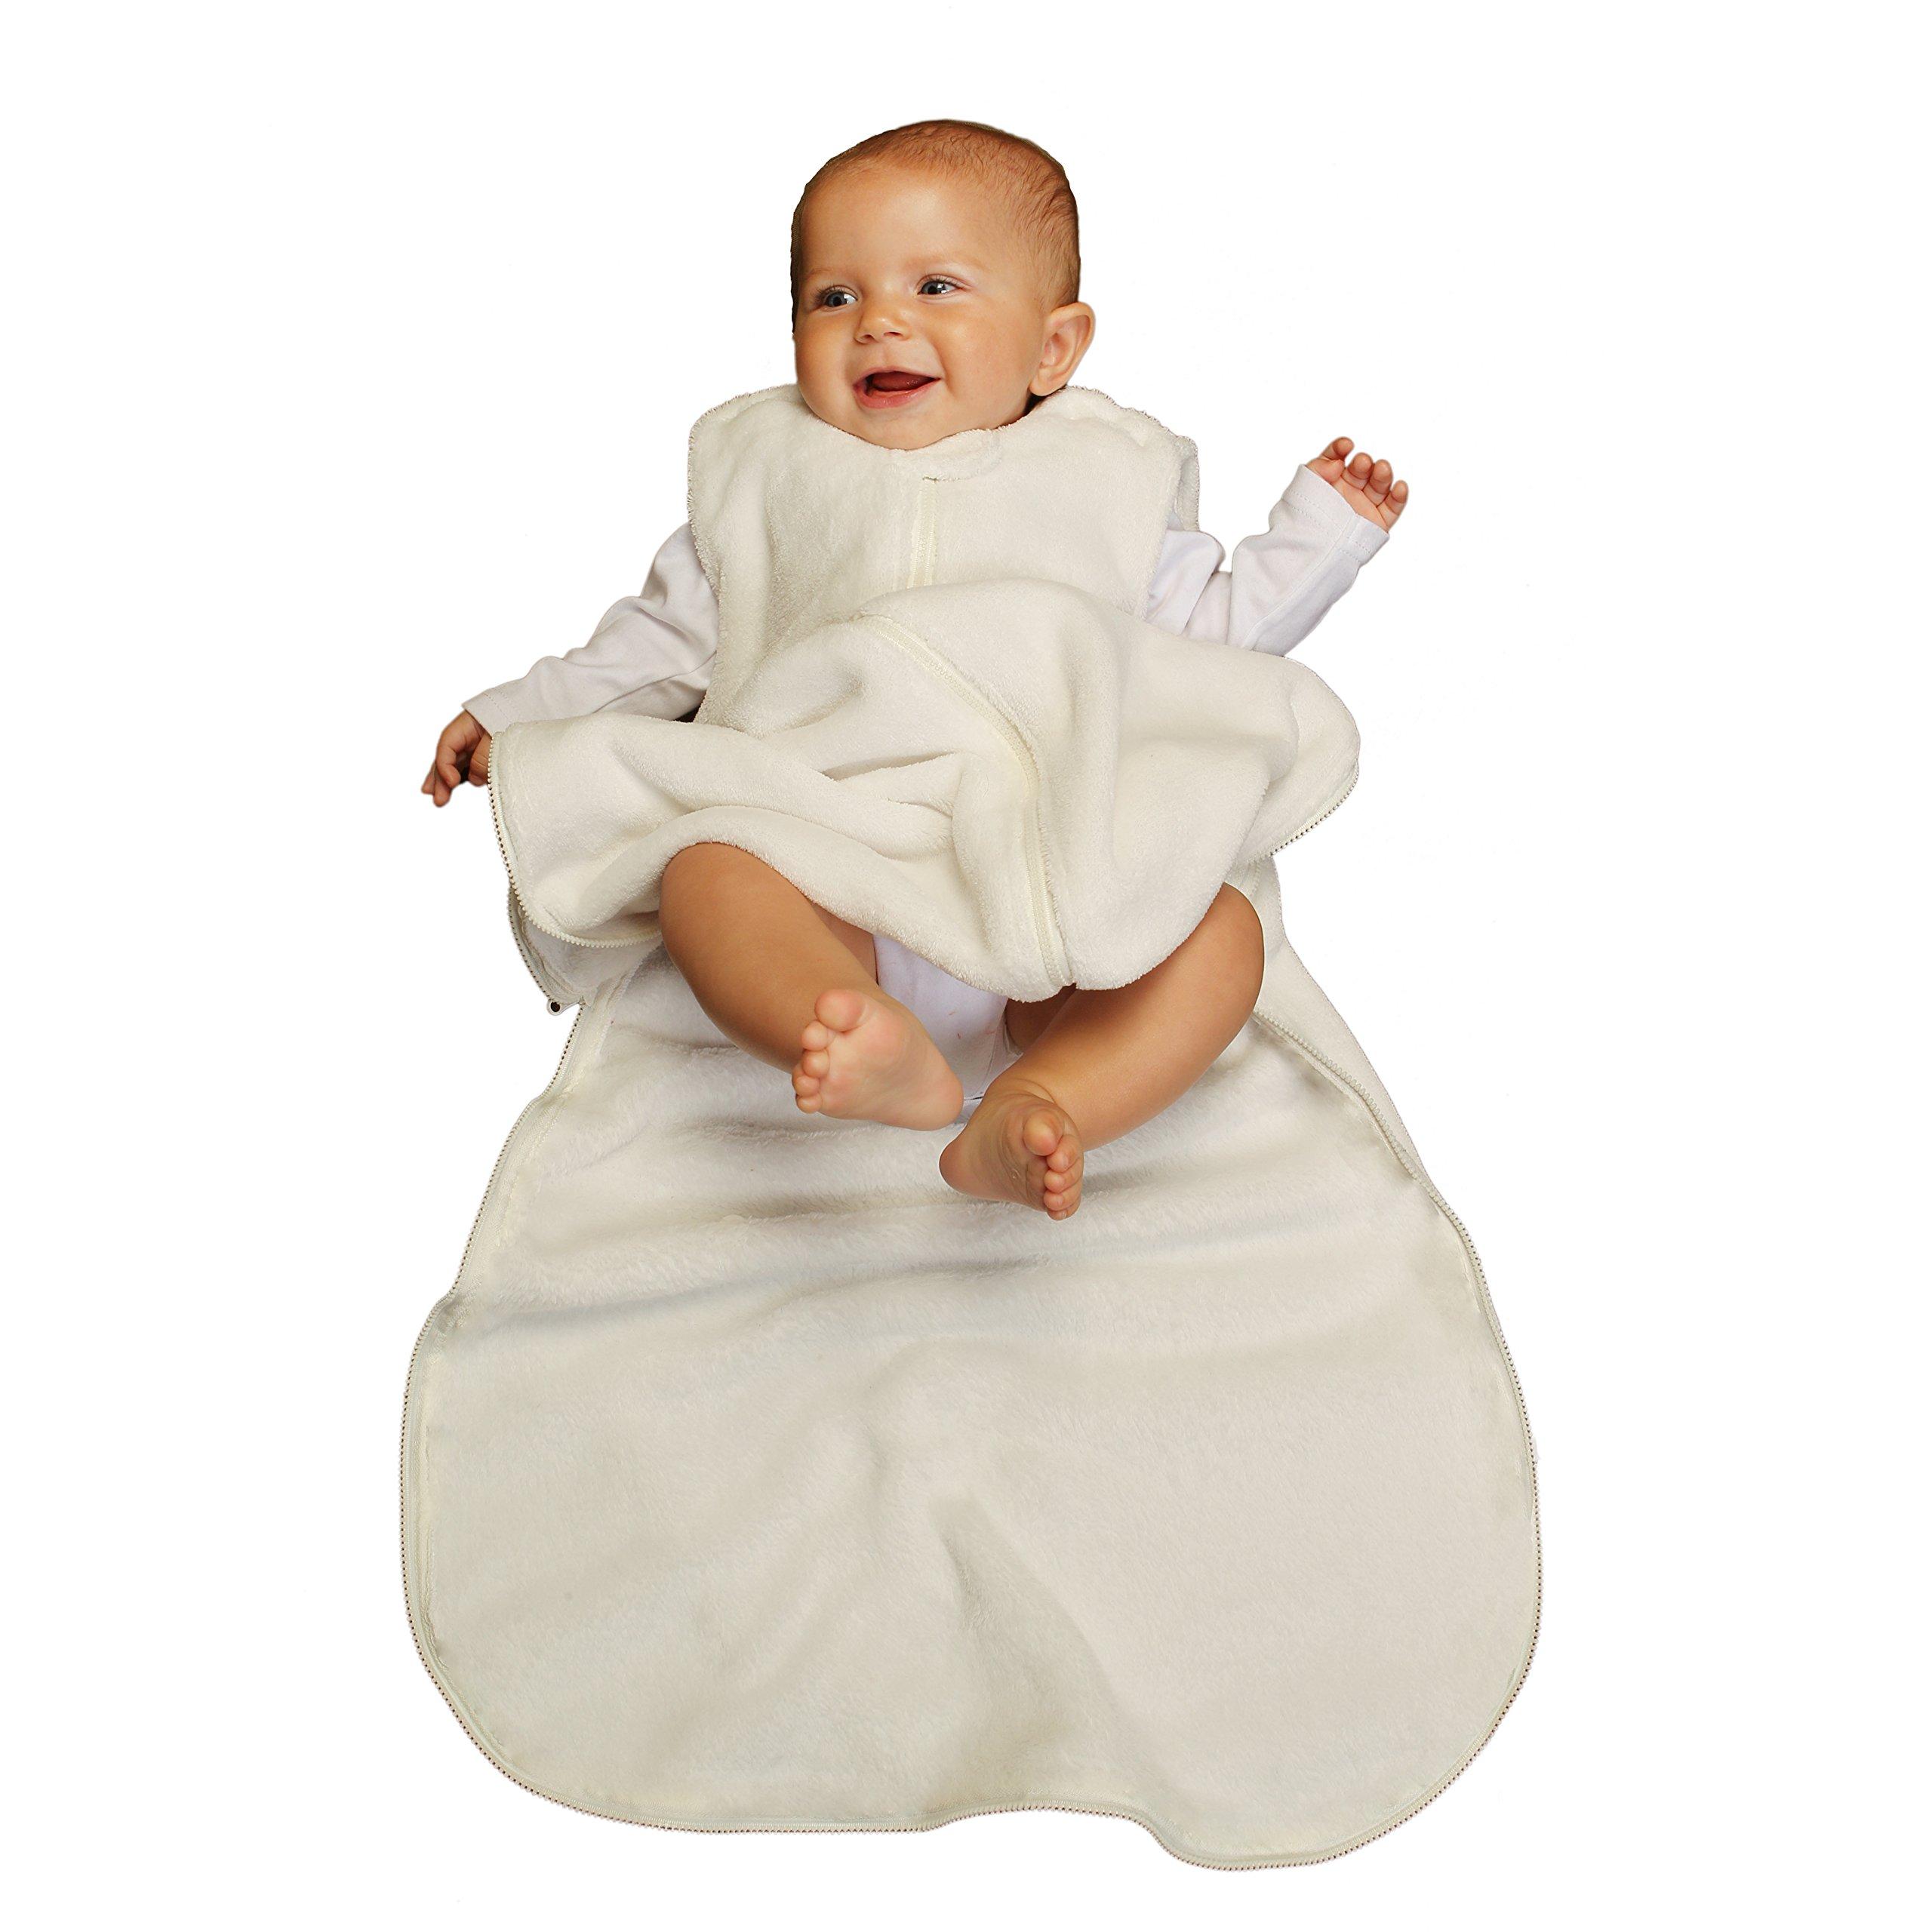 Gunamuna Unisex Fleece Sleep Sack Wearable Baby Blanket Sleeper Cream 0-9 Months by Gunamuna